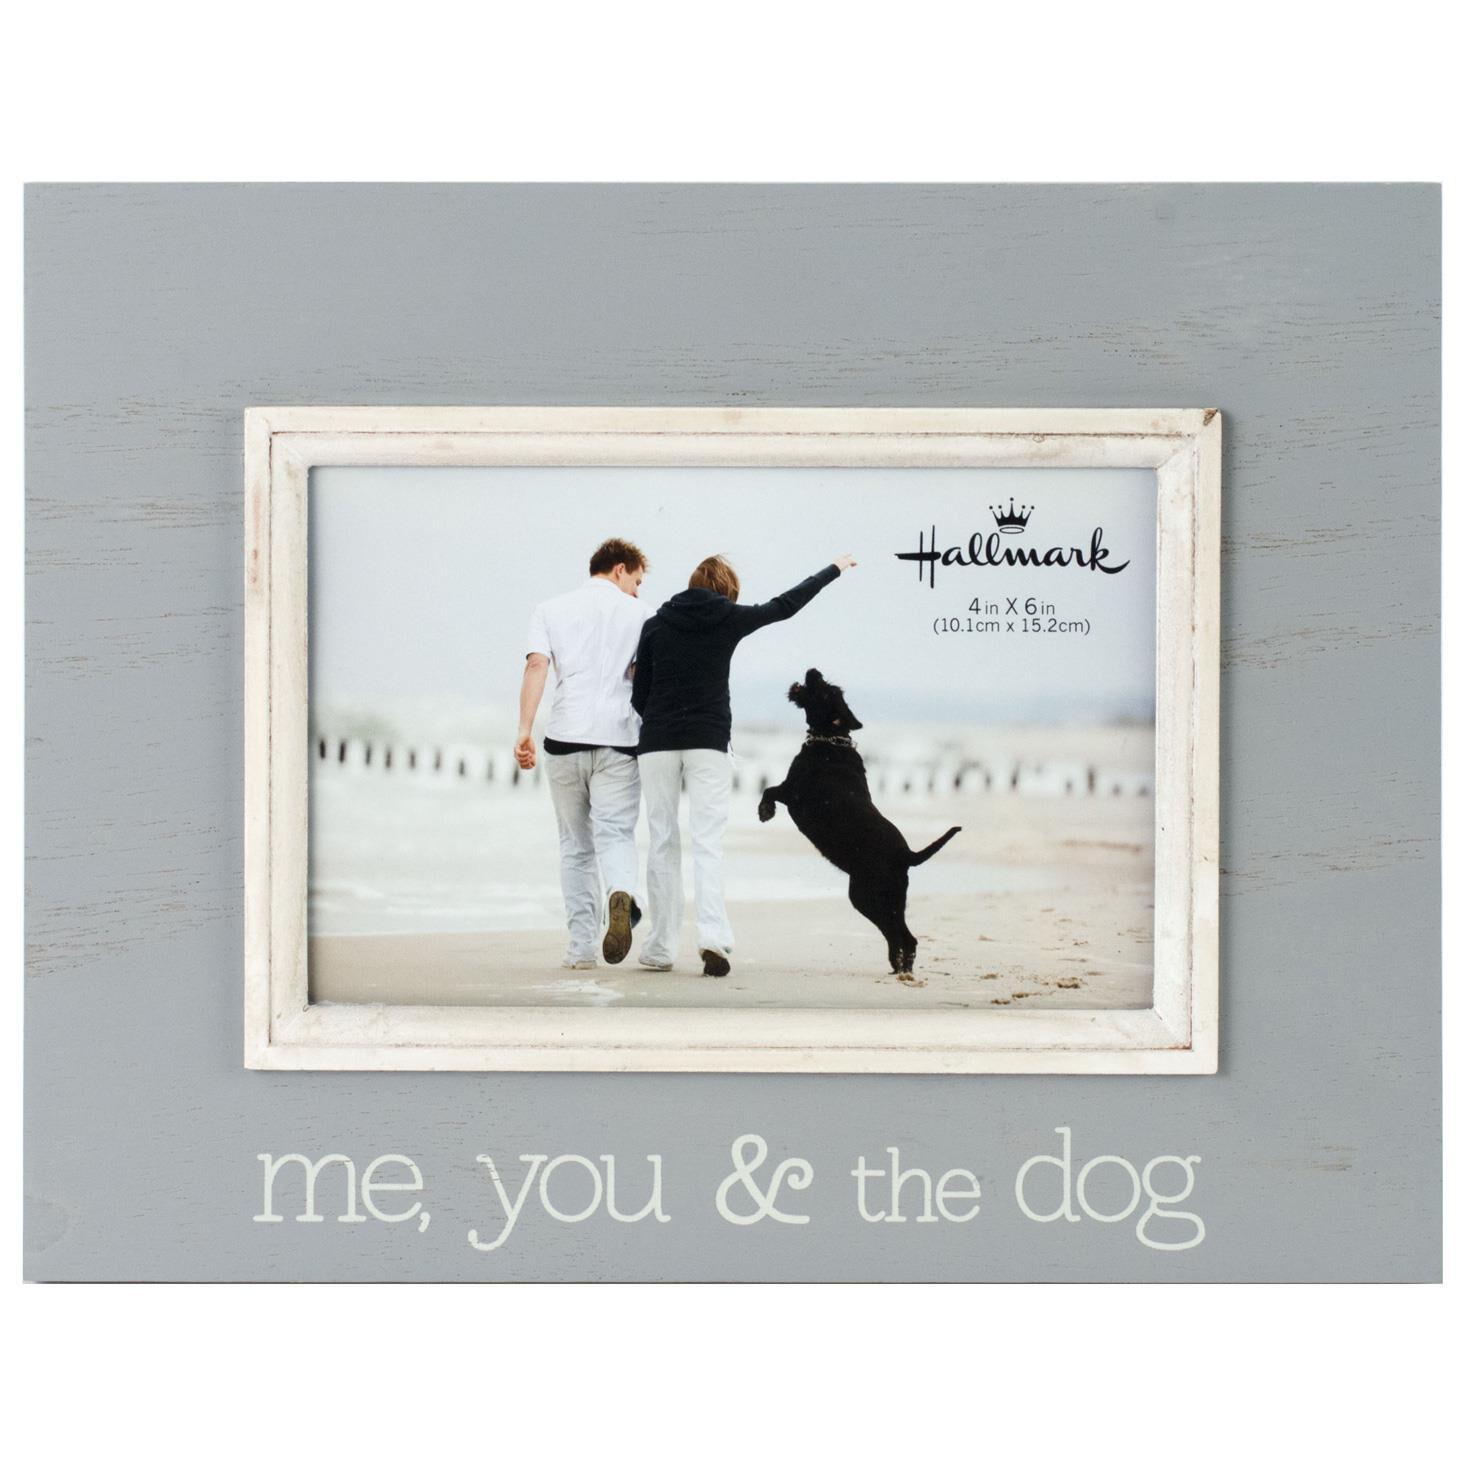 Me you and the dog wood photo frame 4x6 picture frames hallmark jeuxipadfo Images